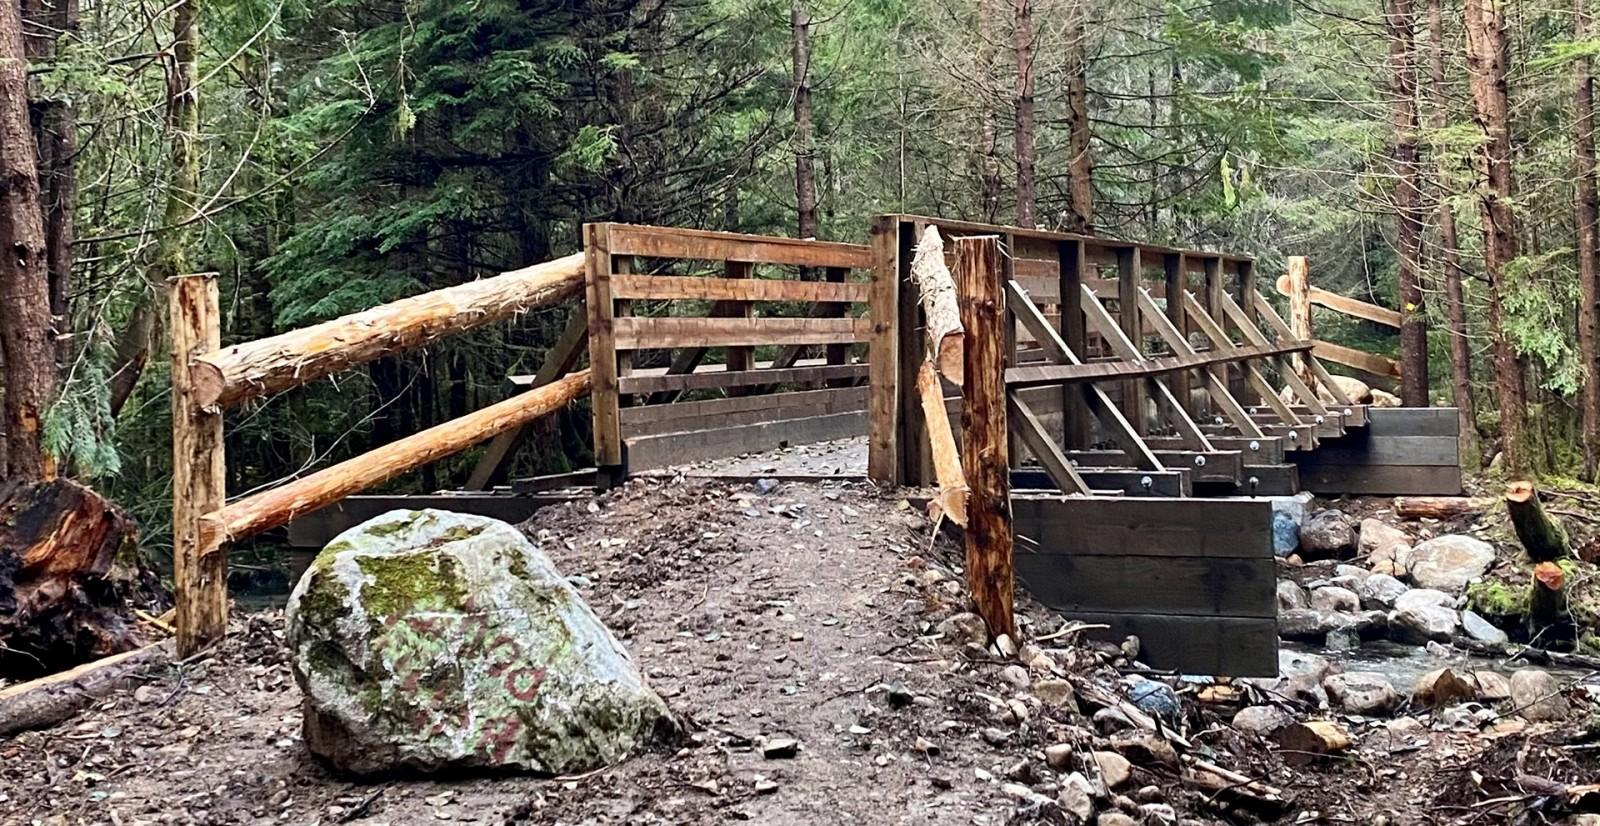 The Nesakwatch Bridge